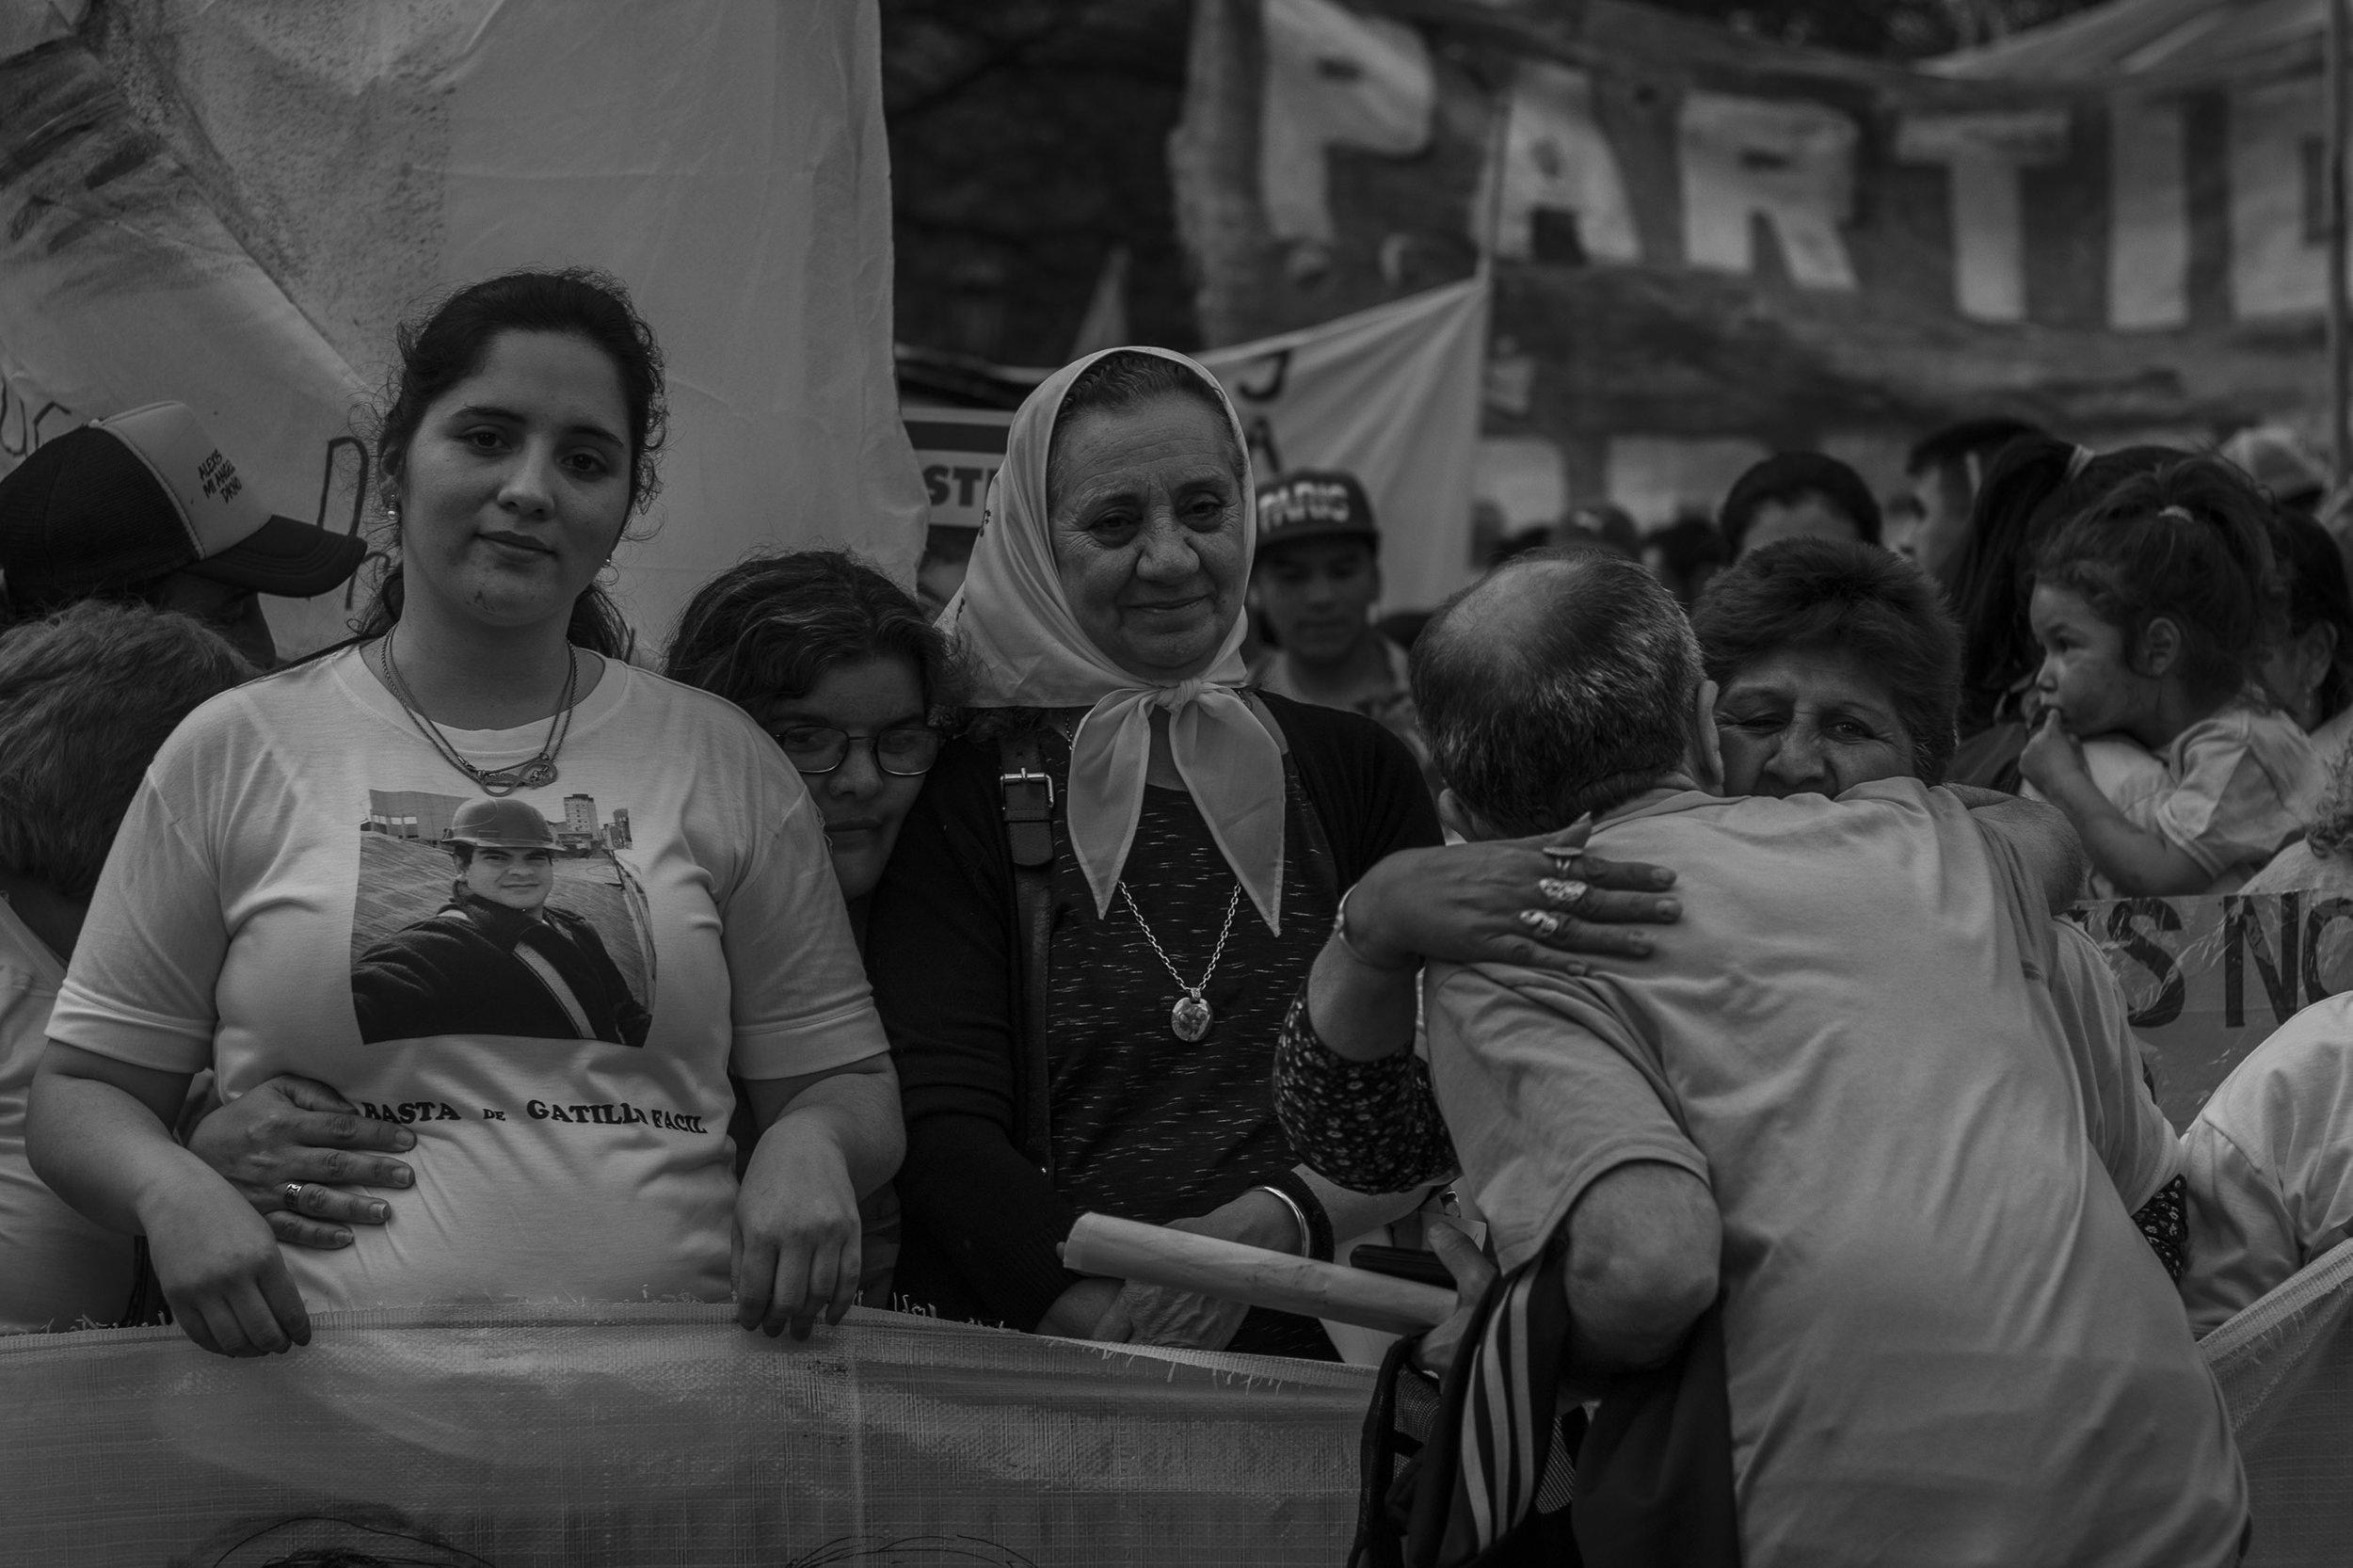 190827_gatillo facil_la palta_58.jpg